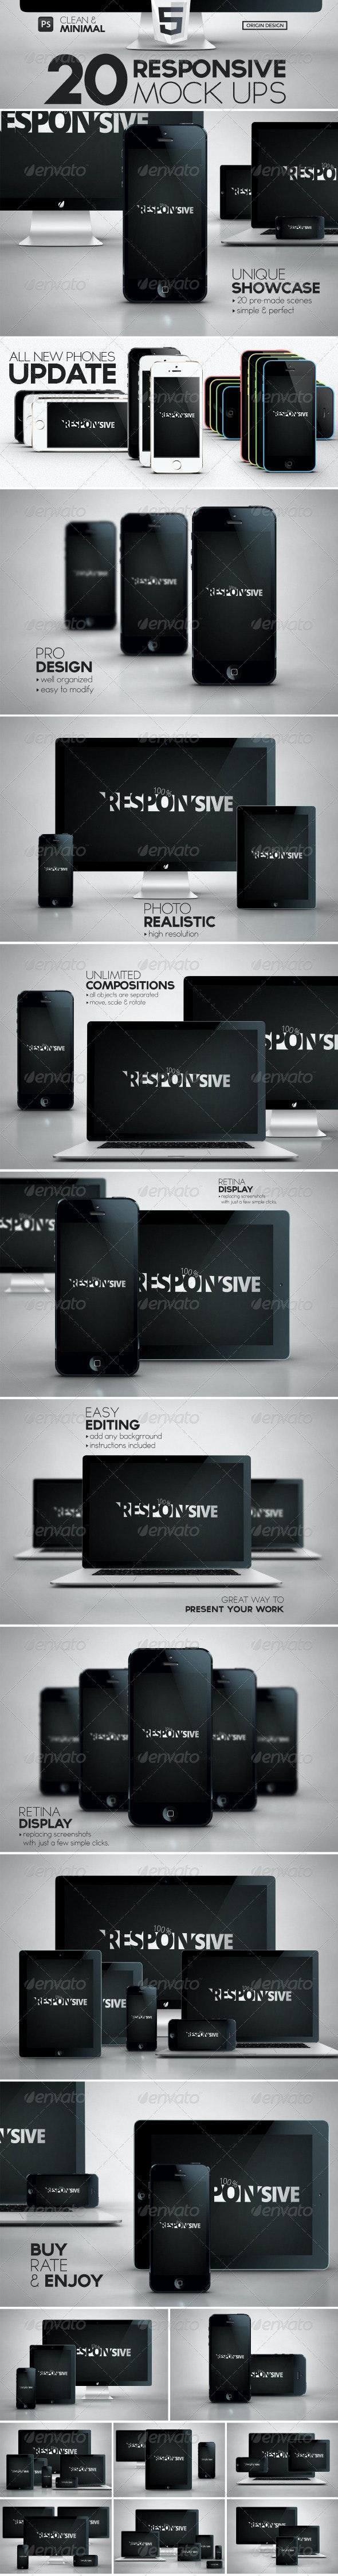 20 Responsive iScreens Mock Up Pack - Multiple Displays